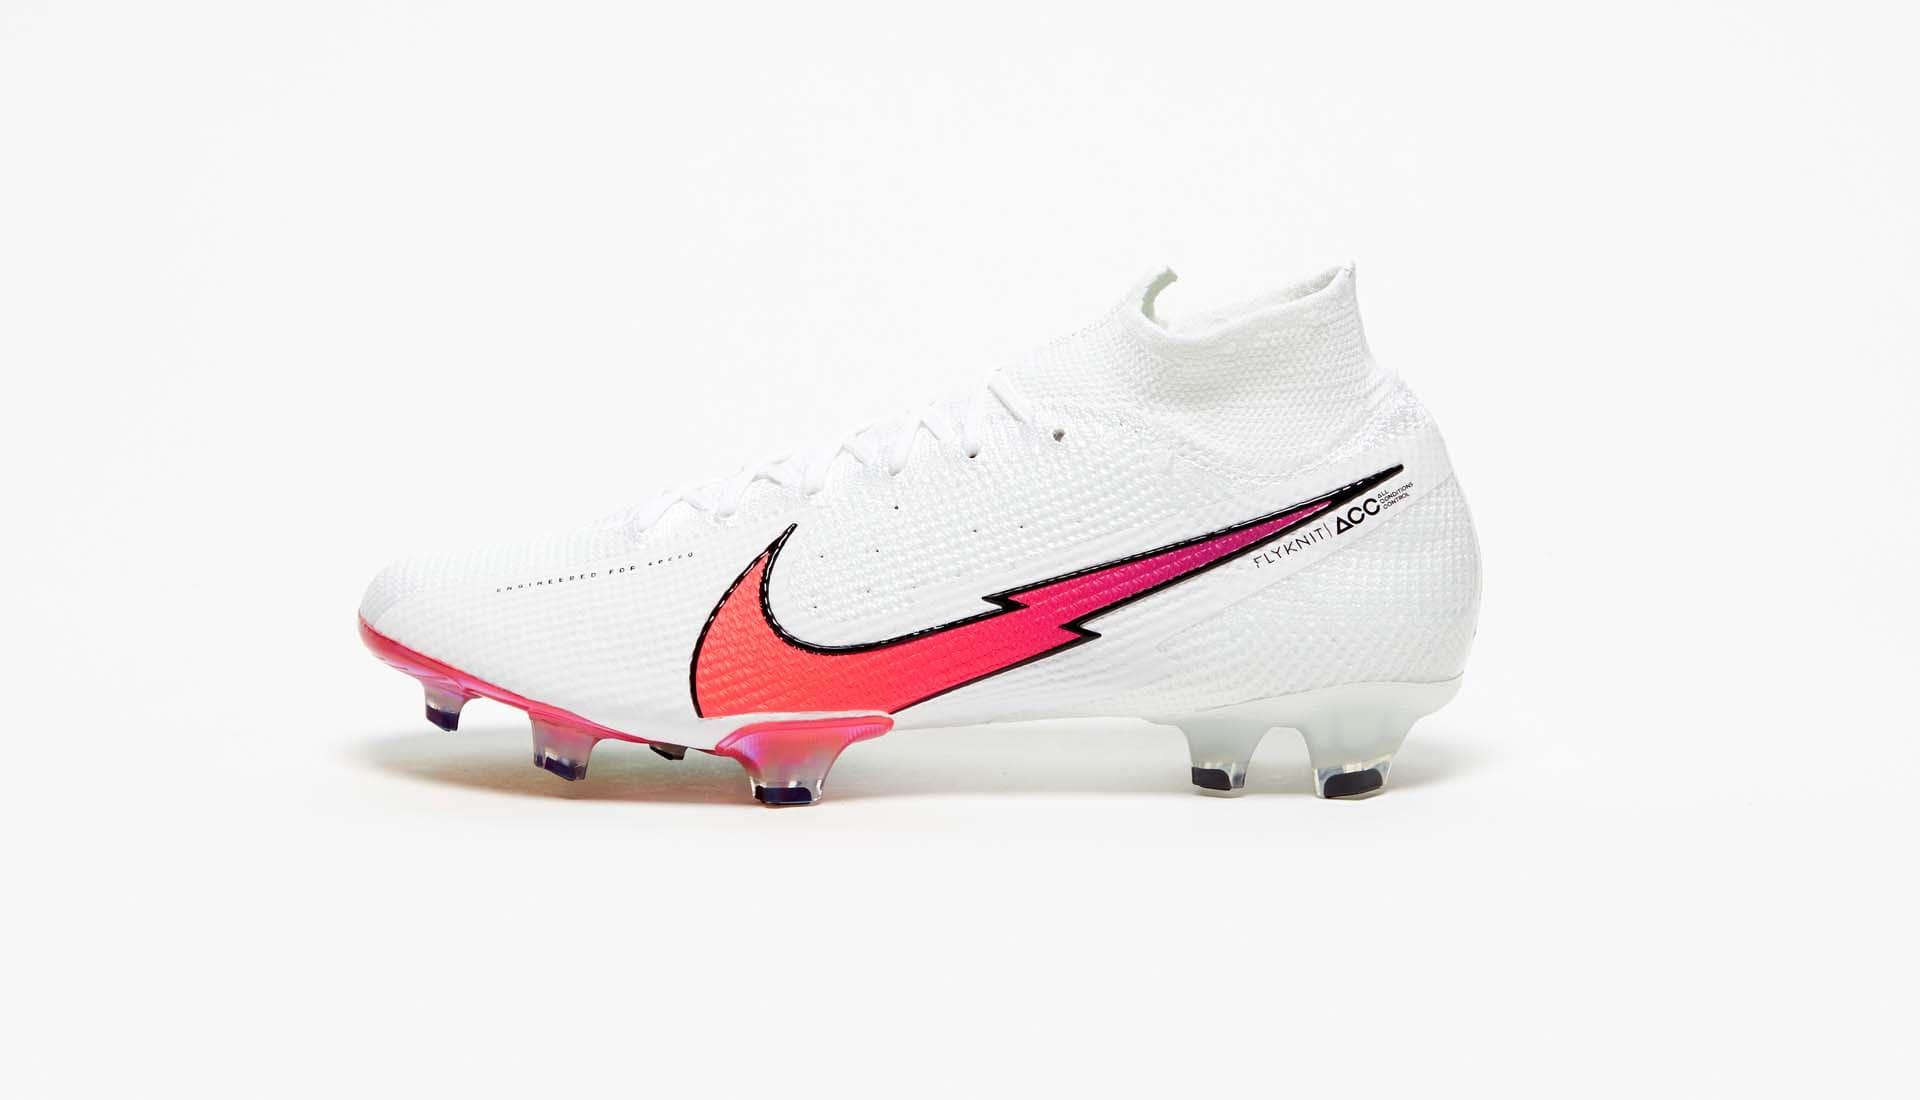 caballo de fuerza colonia apaciguar  First Look At Upcoming Nike Mercurial Colourway - SoccerBible